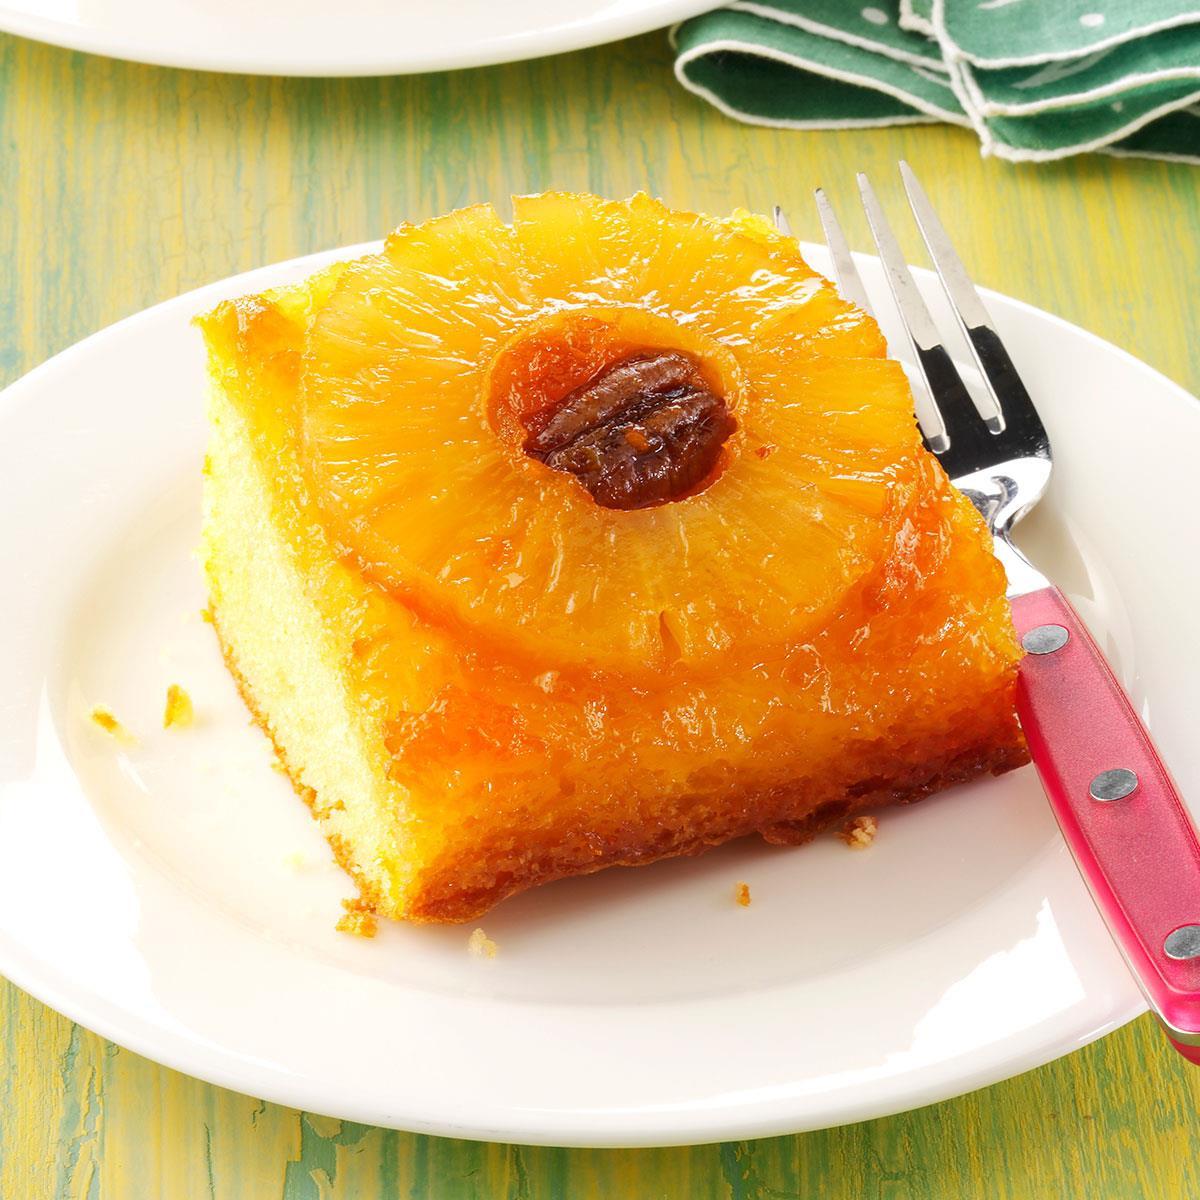 Recipe For Pineapple Upside Down Cake  Easy Pineapple Upside Down Cake Recipe